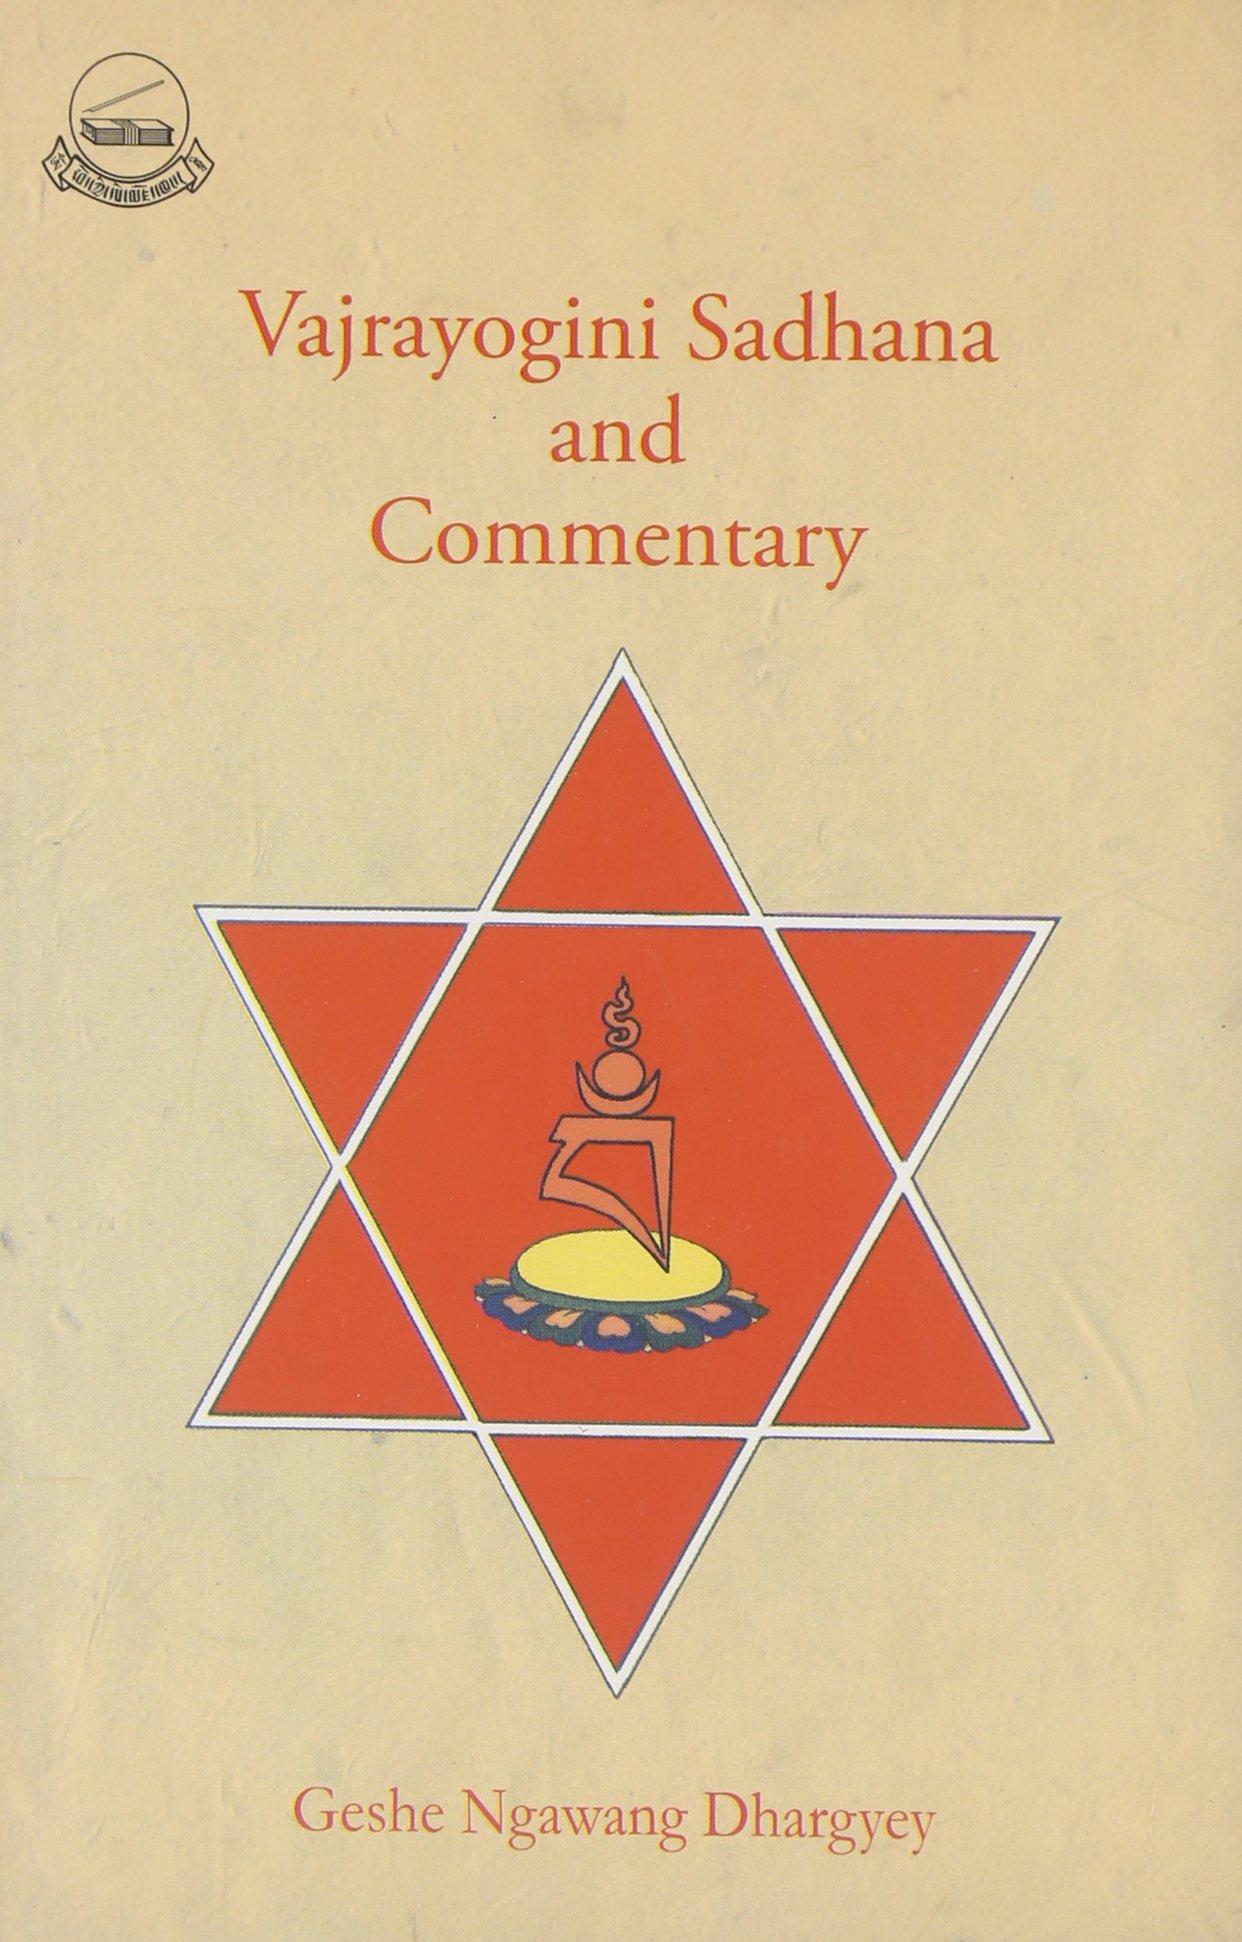 Vajrayogini Sadhana and Commentary: Geshe Ngawang Dhargyey